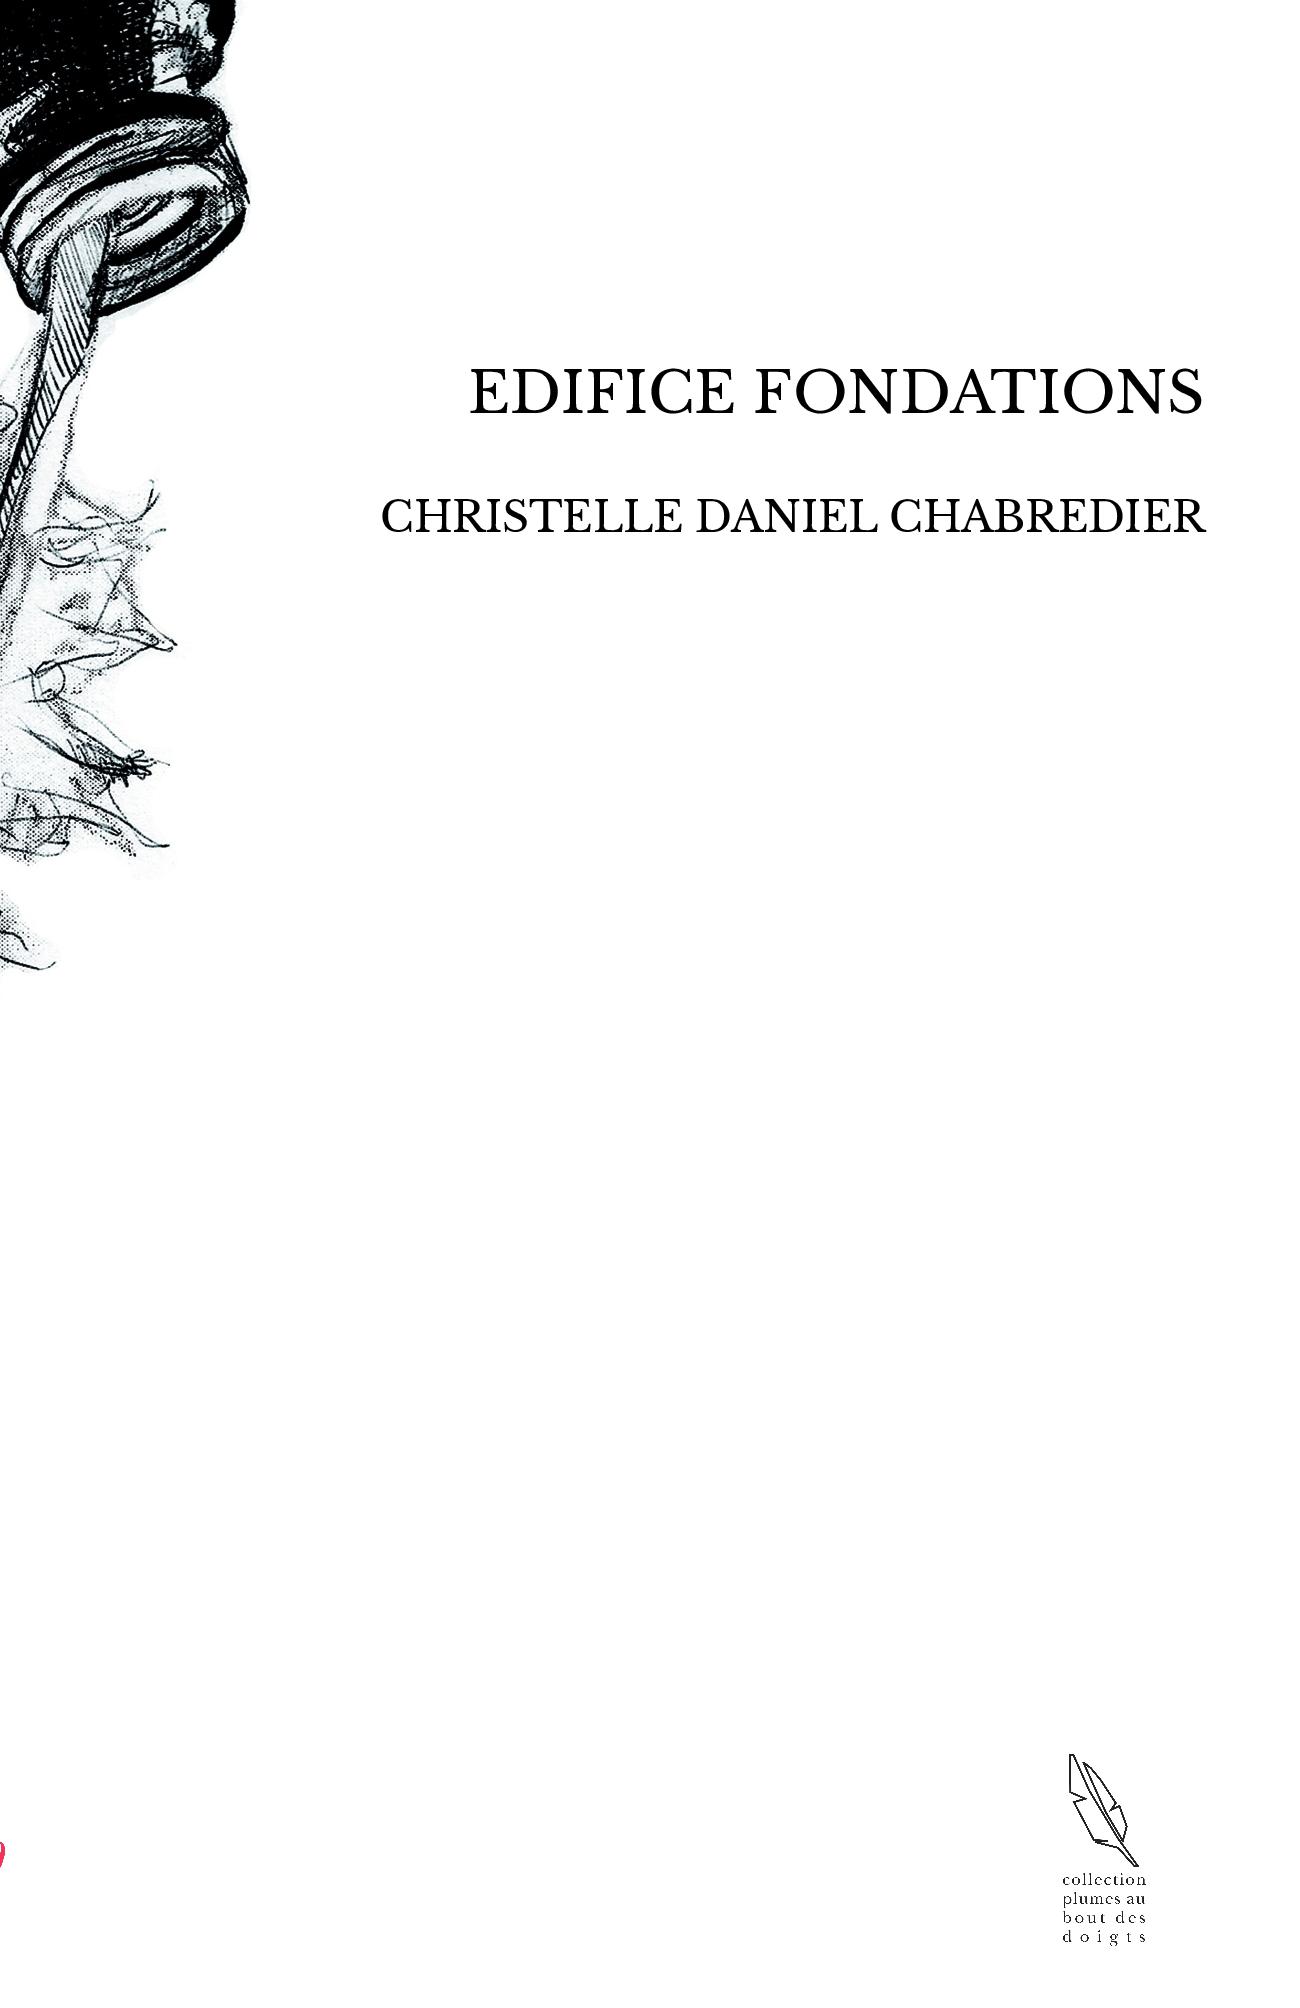 EDIFICE FONDATIONS